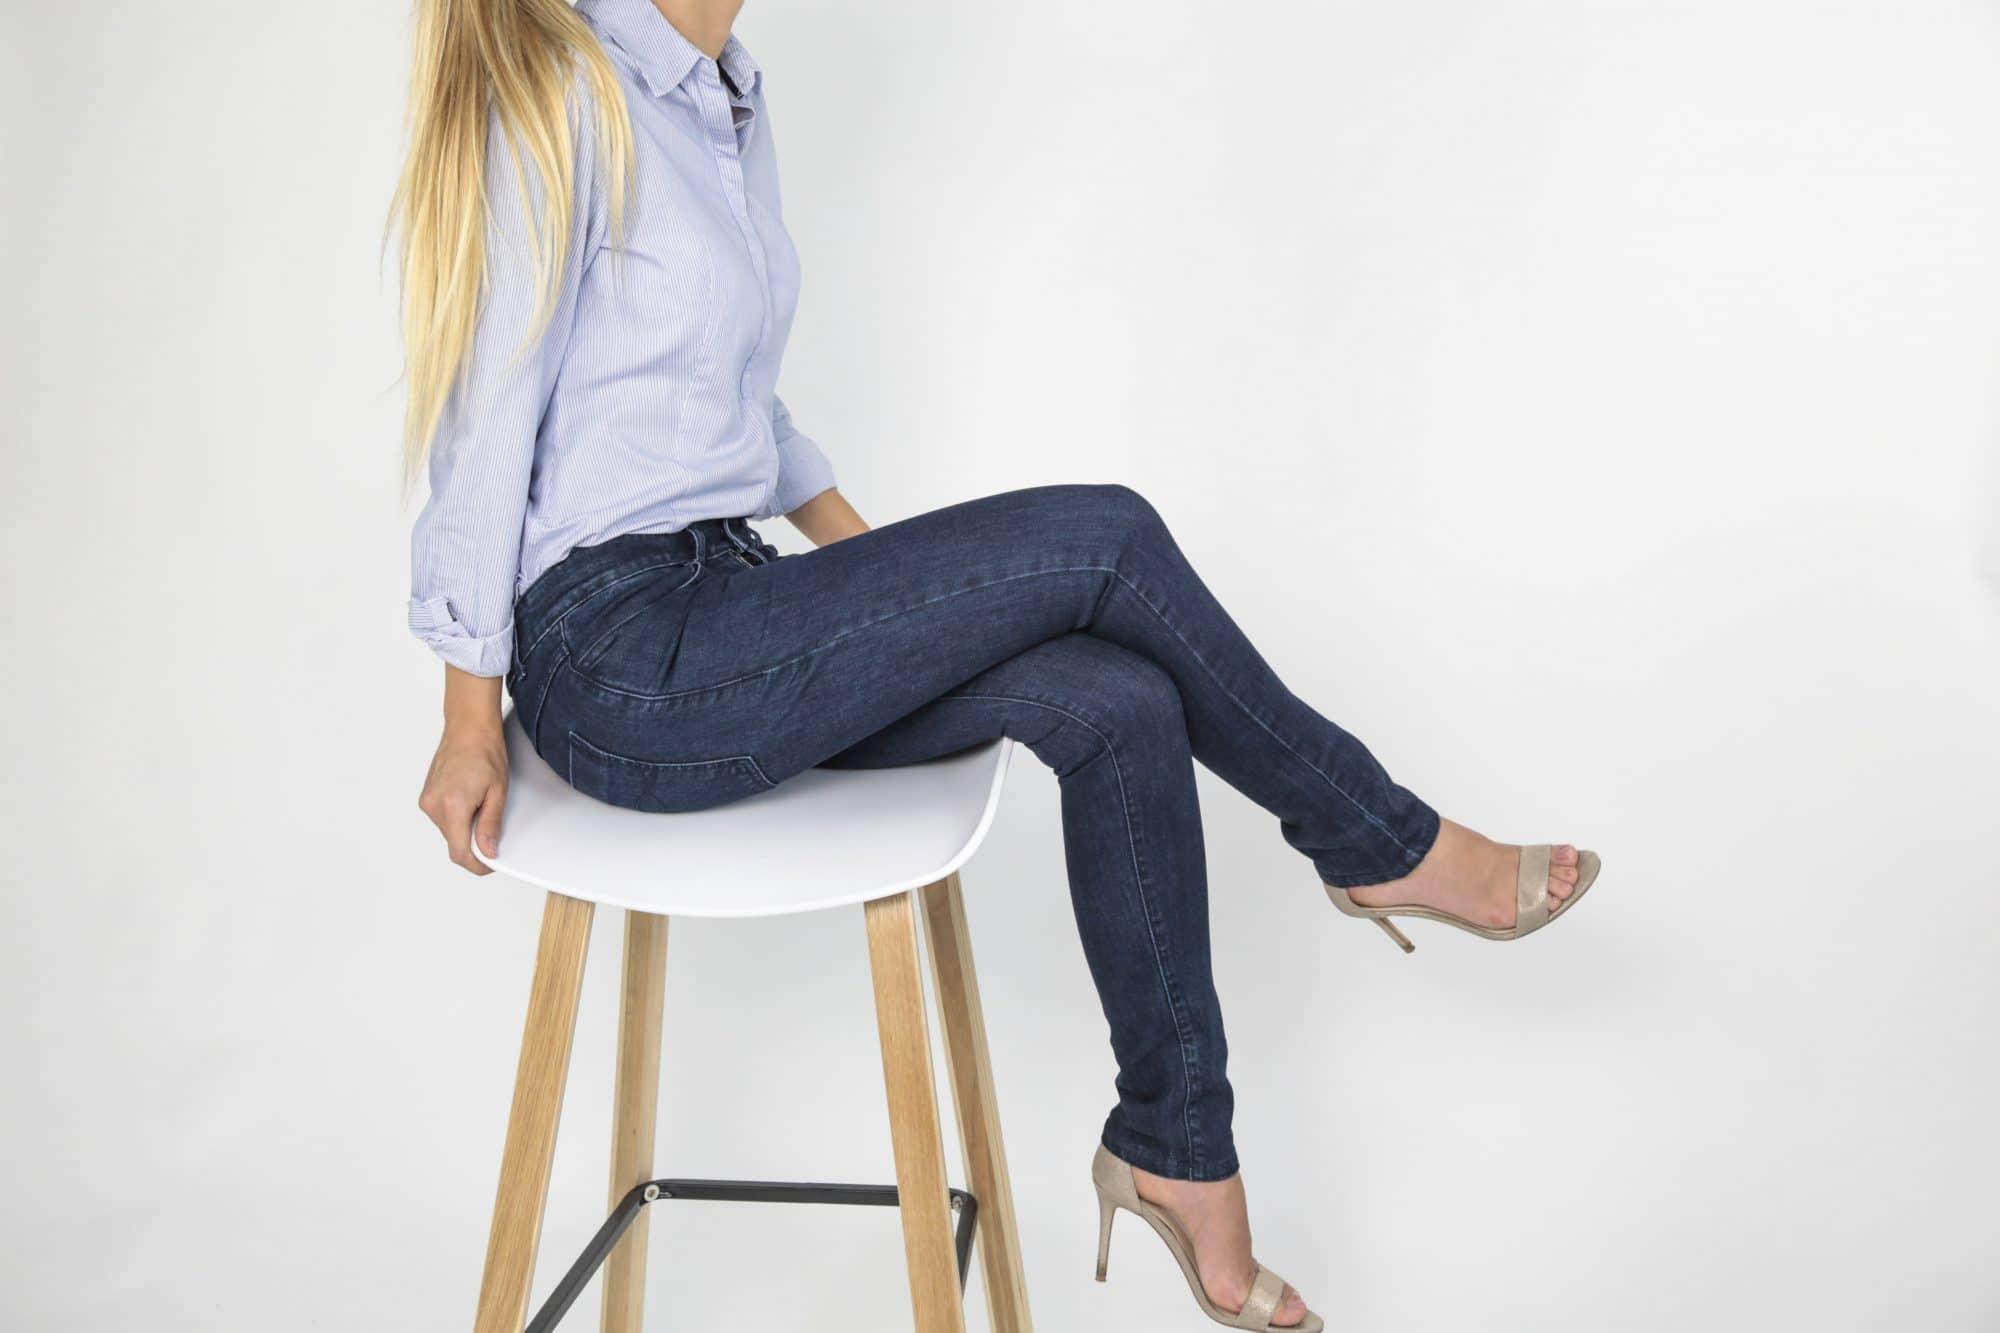 Faite Jeans - Product Photography Australia by Recal Media-62